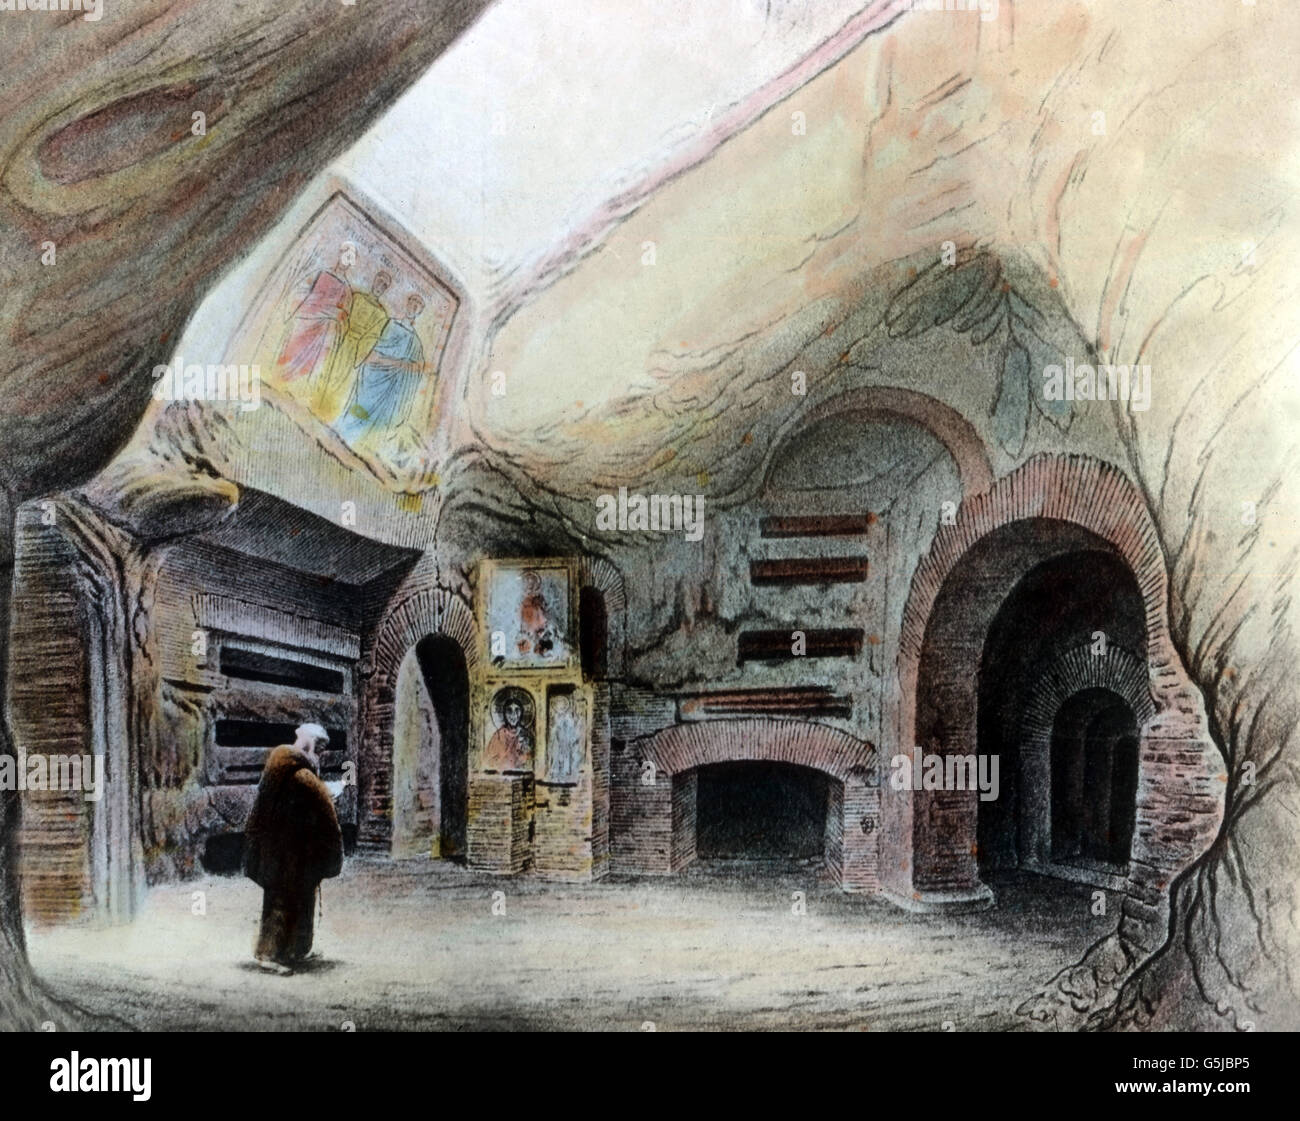 En der Katakombe der heiligen Caecilia en Rom, Italien 1920er Jahre. En la tumba de Santa Cecilia en Roma, Italia, 1920. Foto de stock